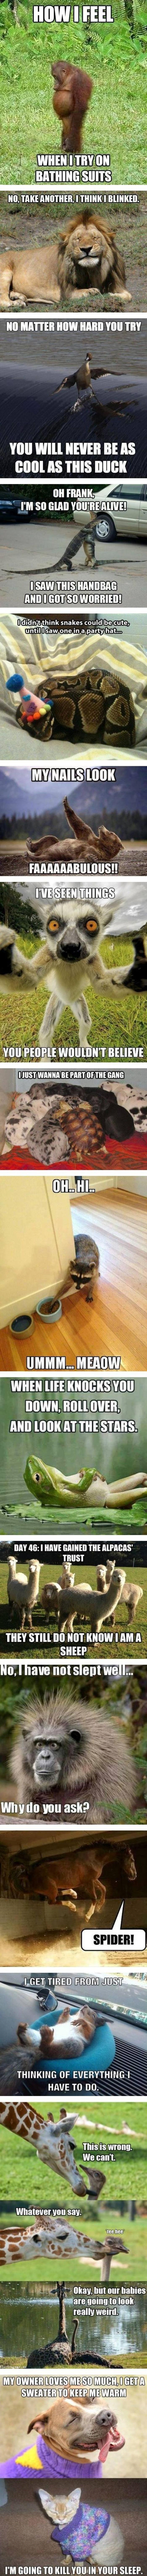 Brilliantly Funny Animal Memes